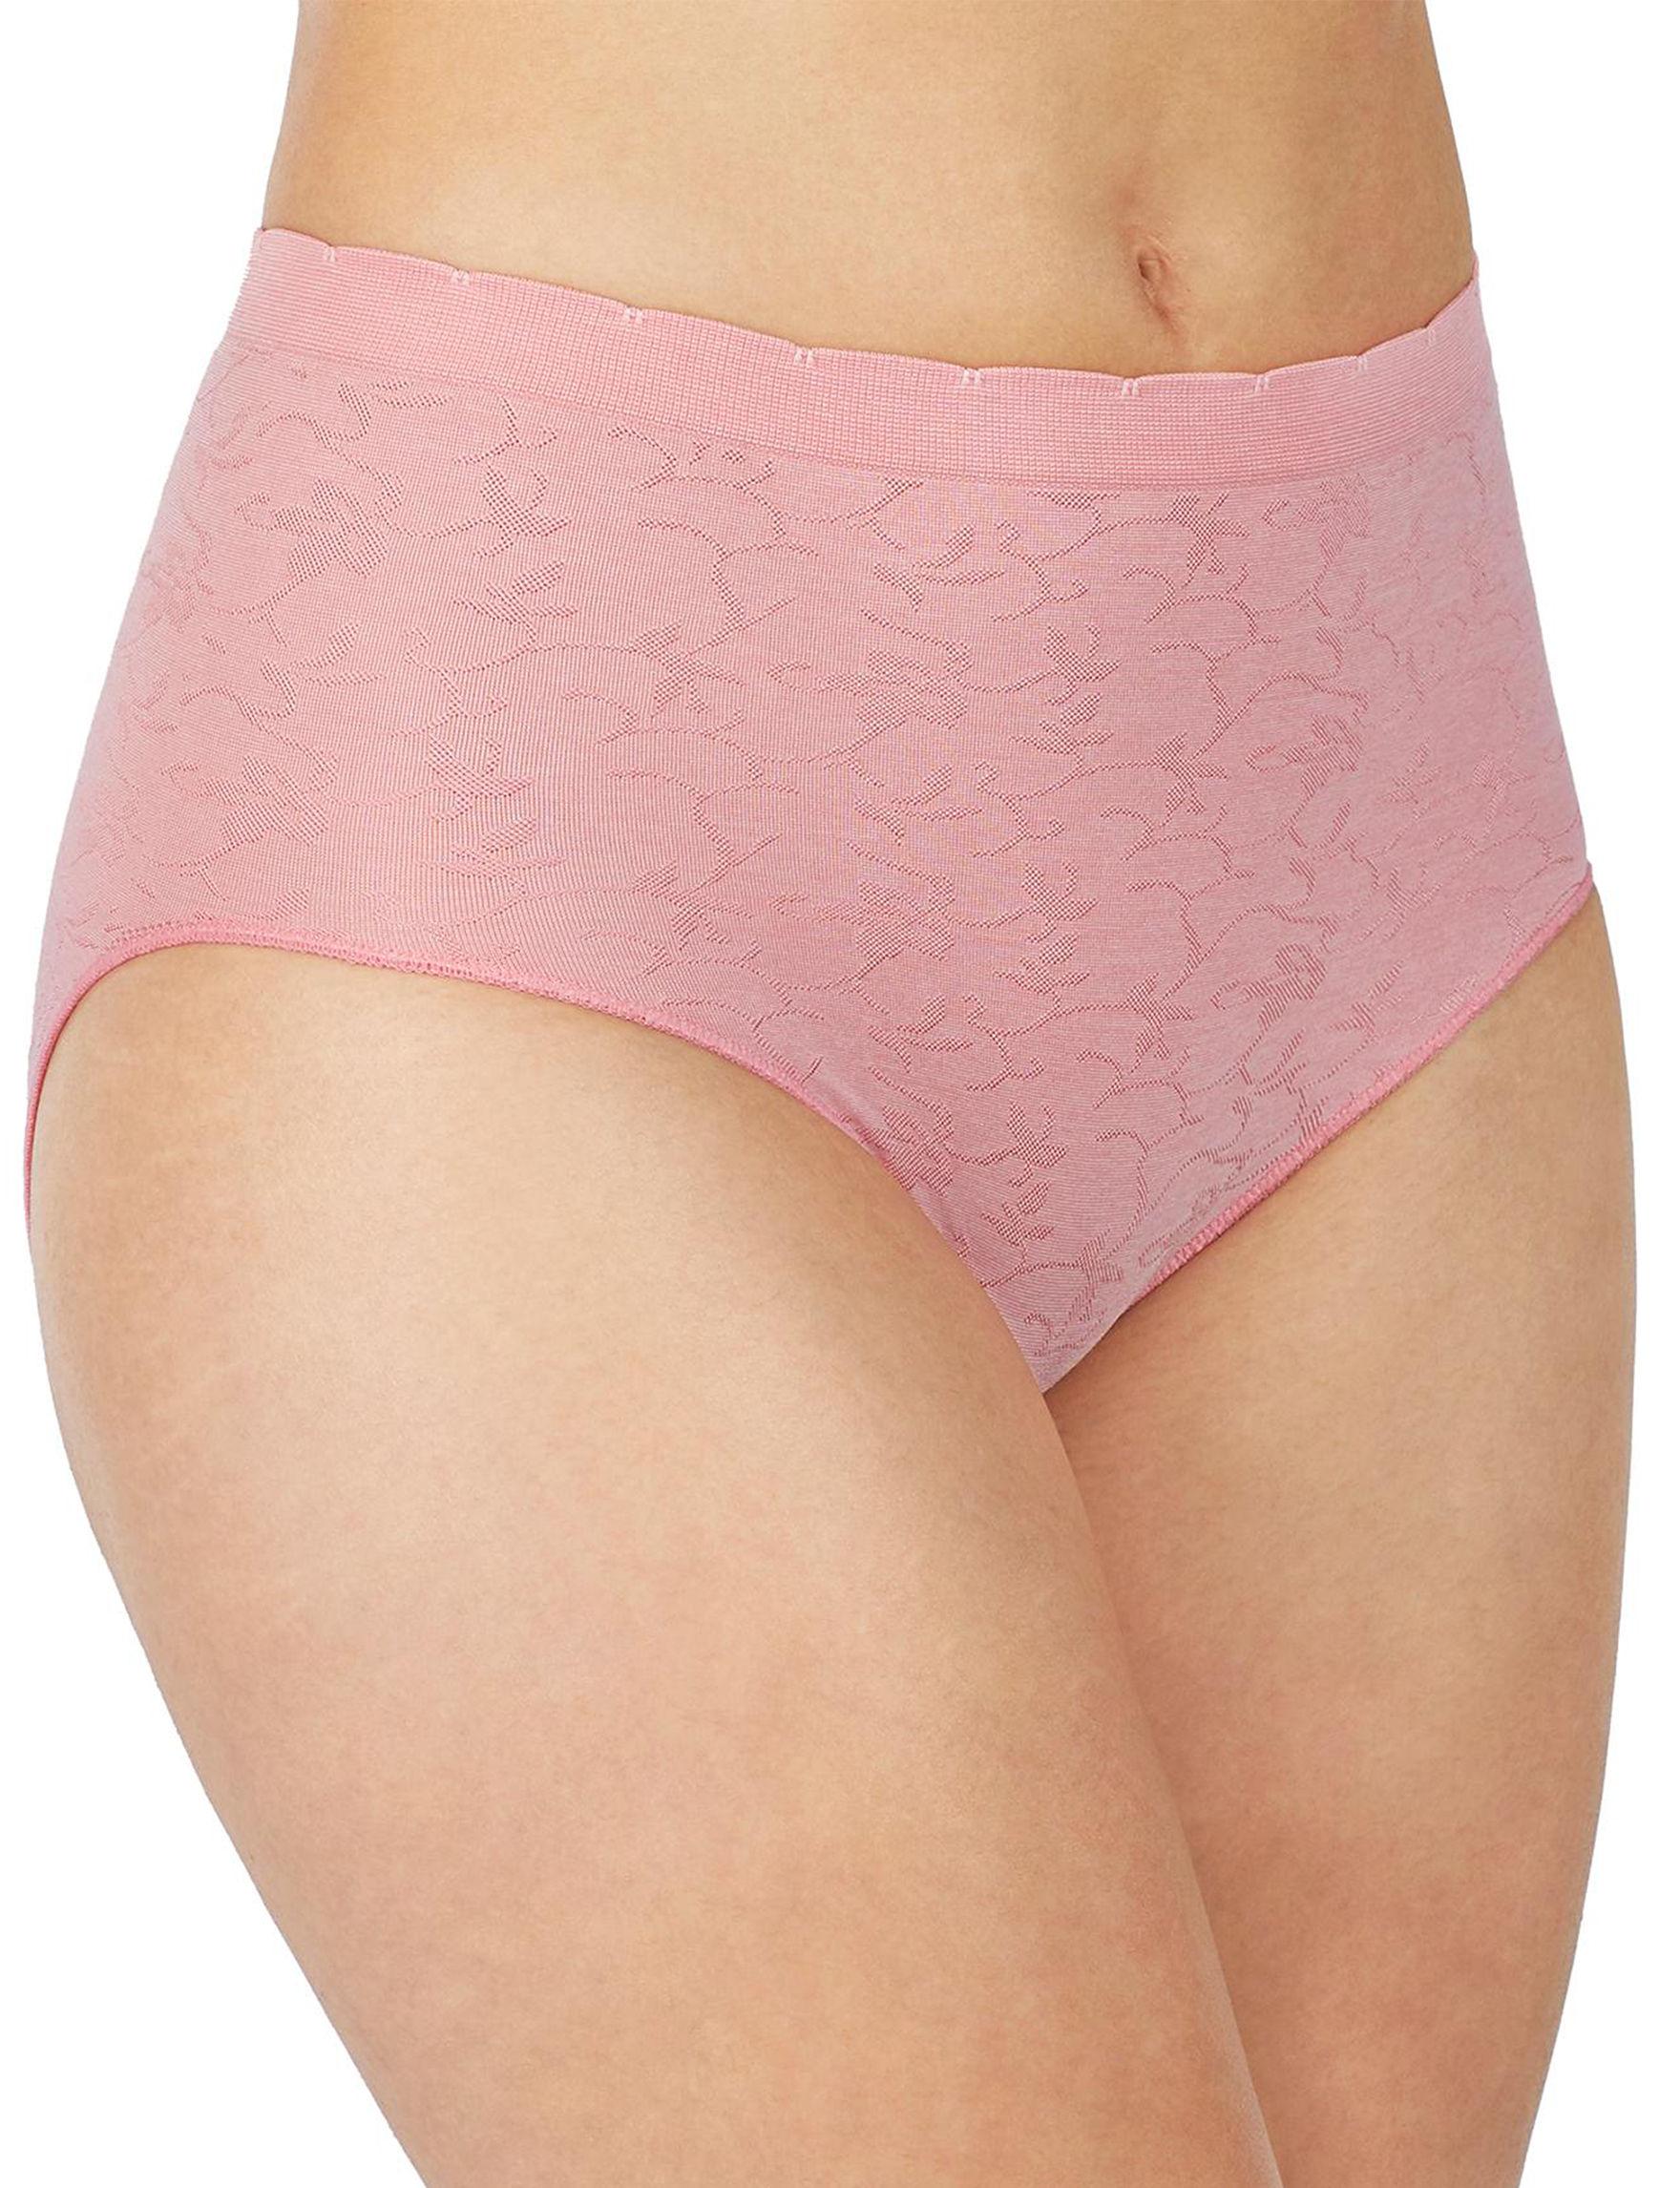 Ellen Tracy Pink Panties Briefs Seamless